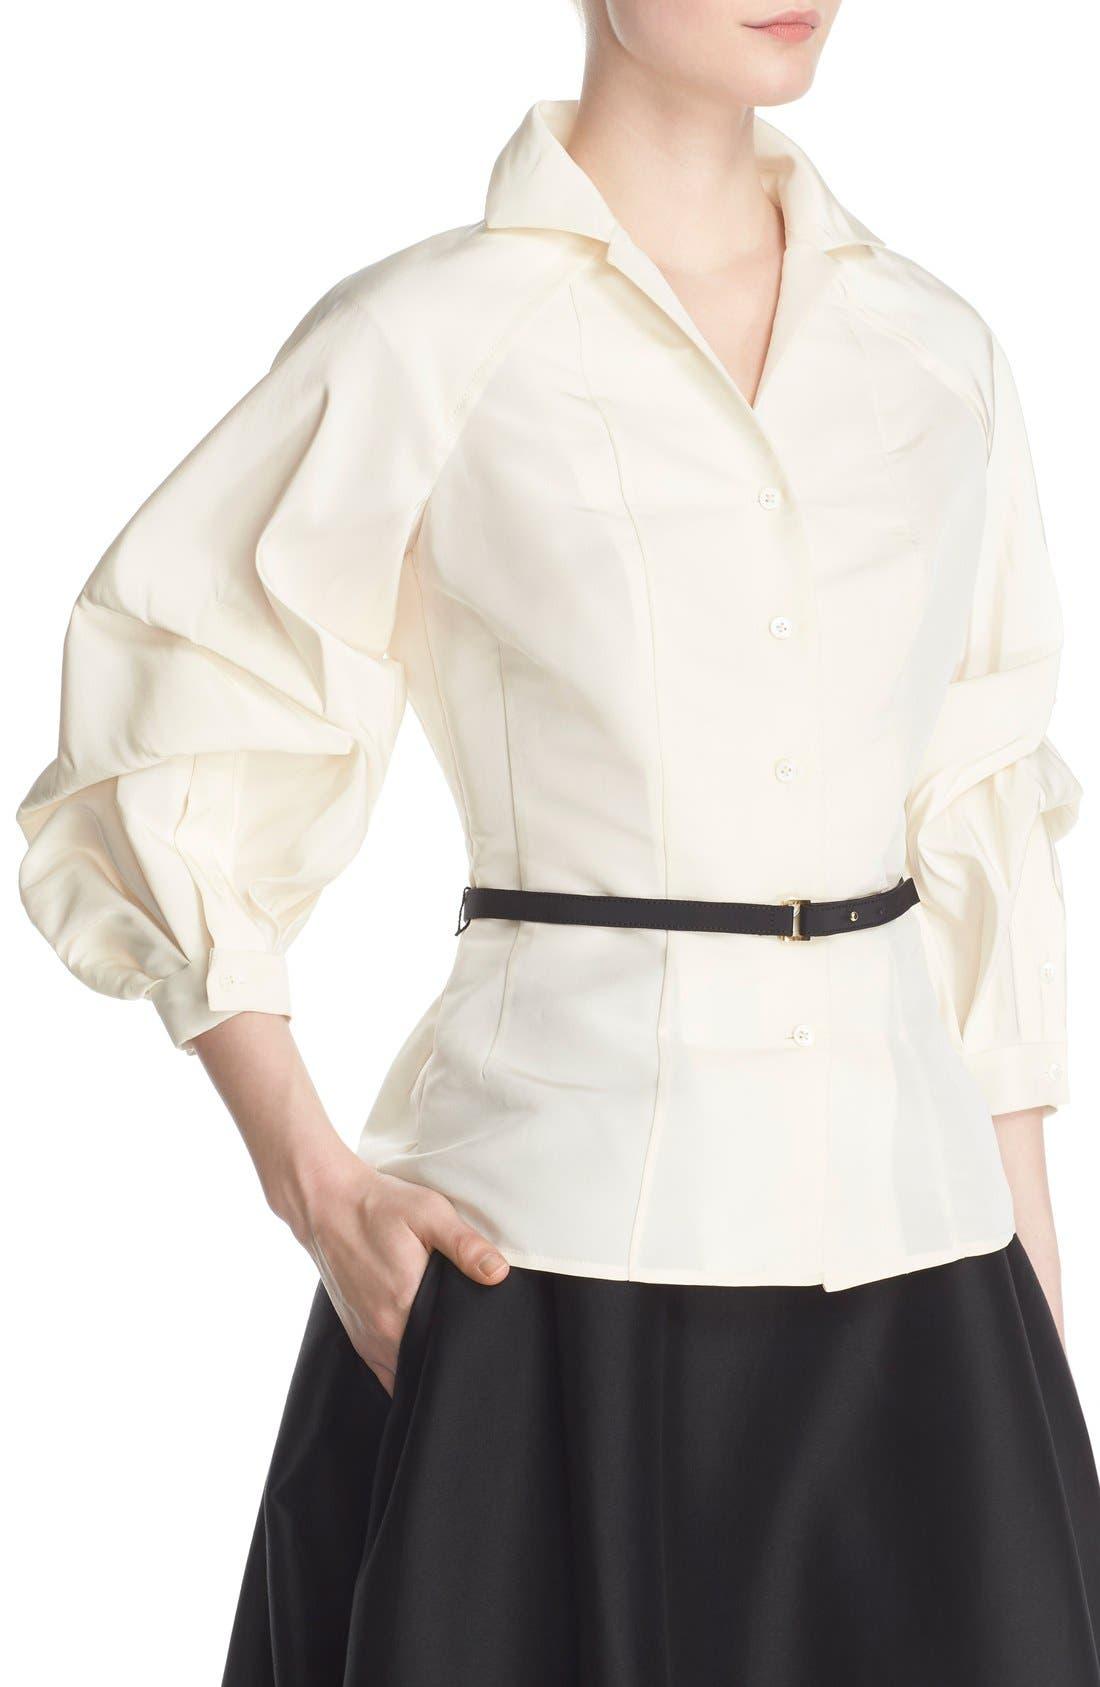 Main Image - Carolina Herrera Full Sleeve Silk Blouse